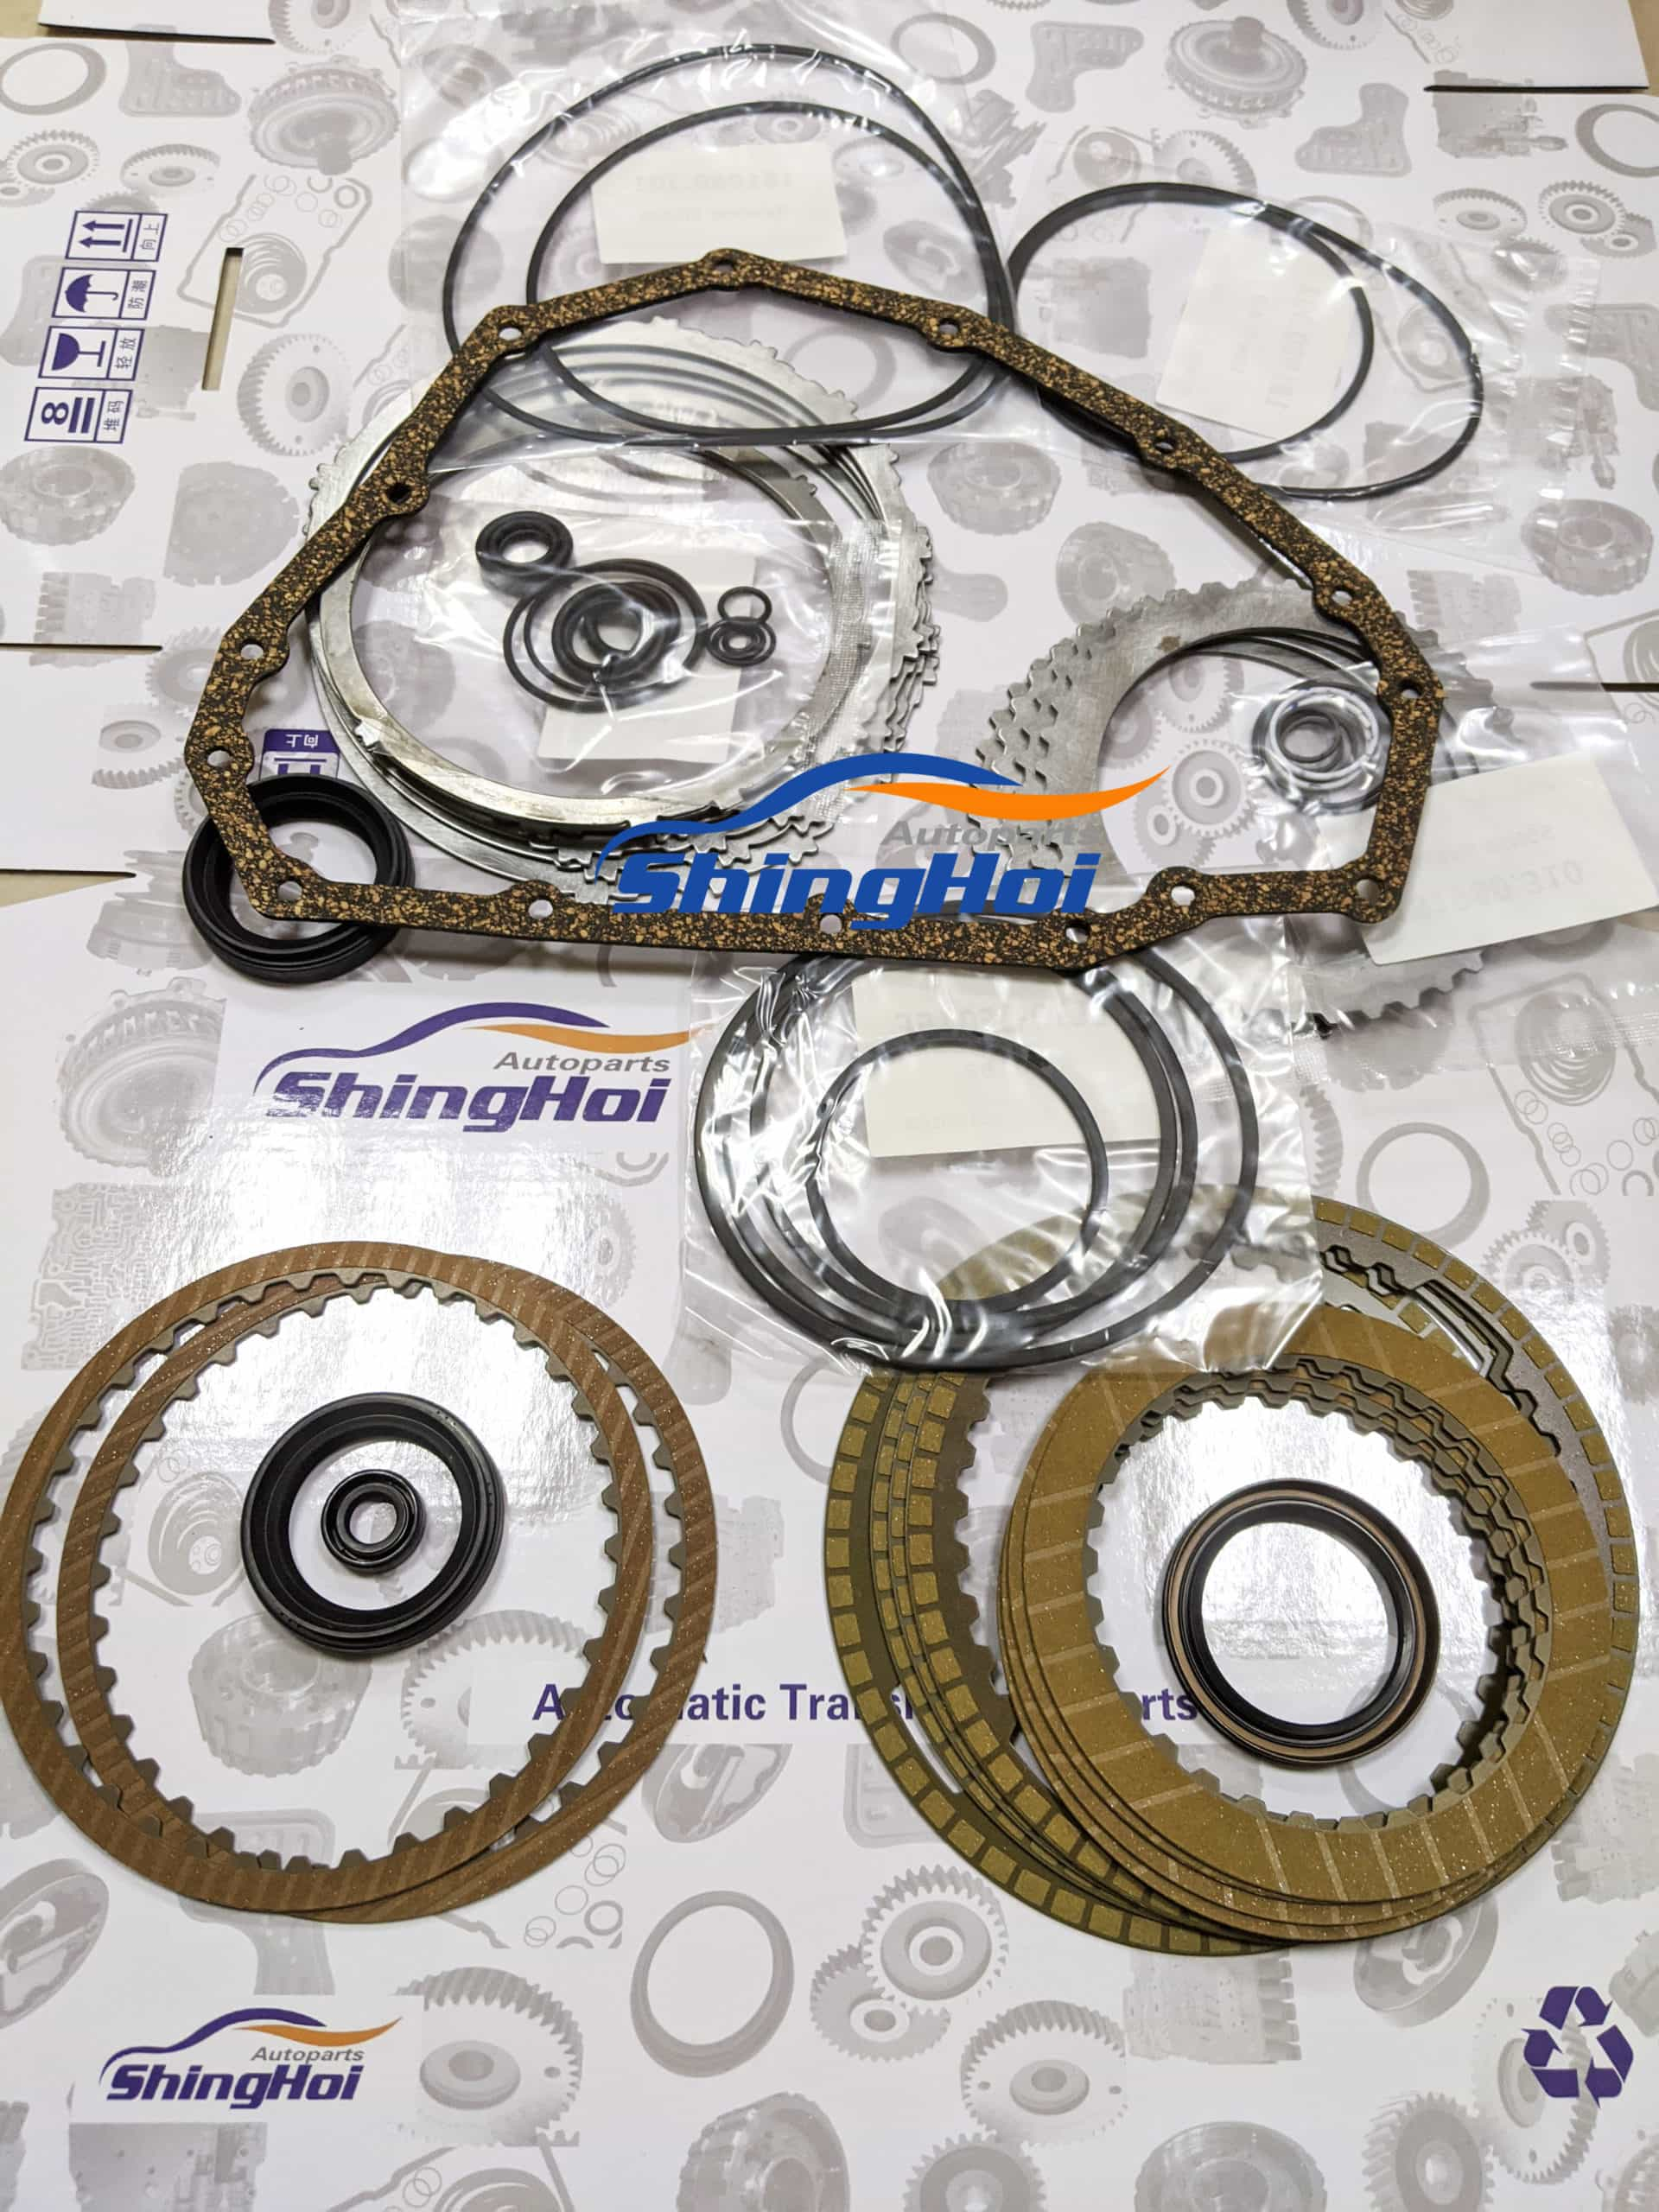 2x Transmission Oil Filter+Pan Gasket Kit For Nissan Sentra Swift Suzuki 33010JF015 RE0F11A JF015E